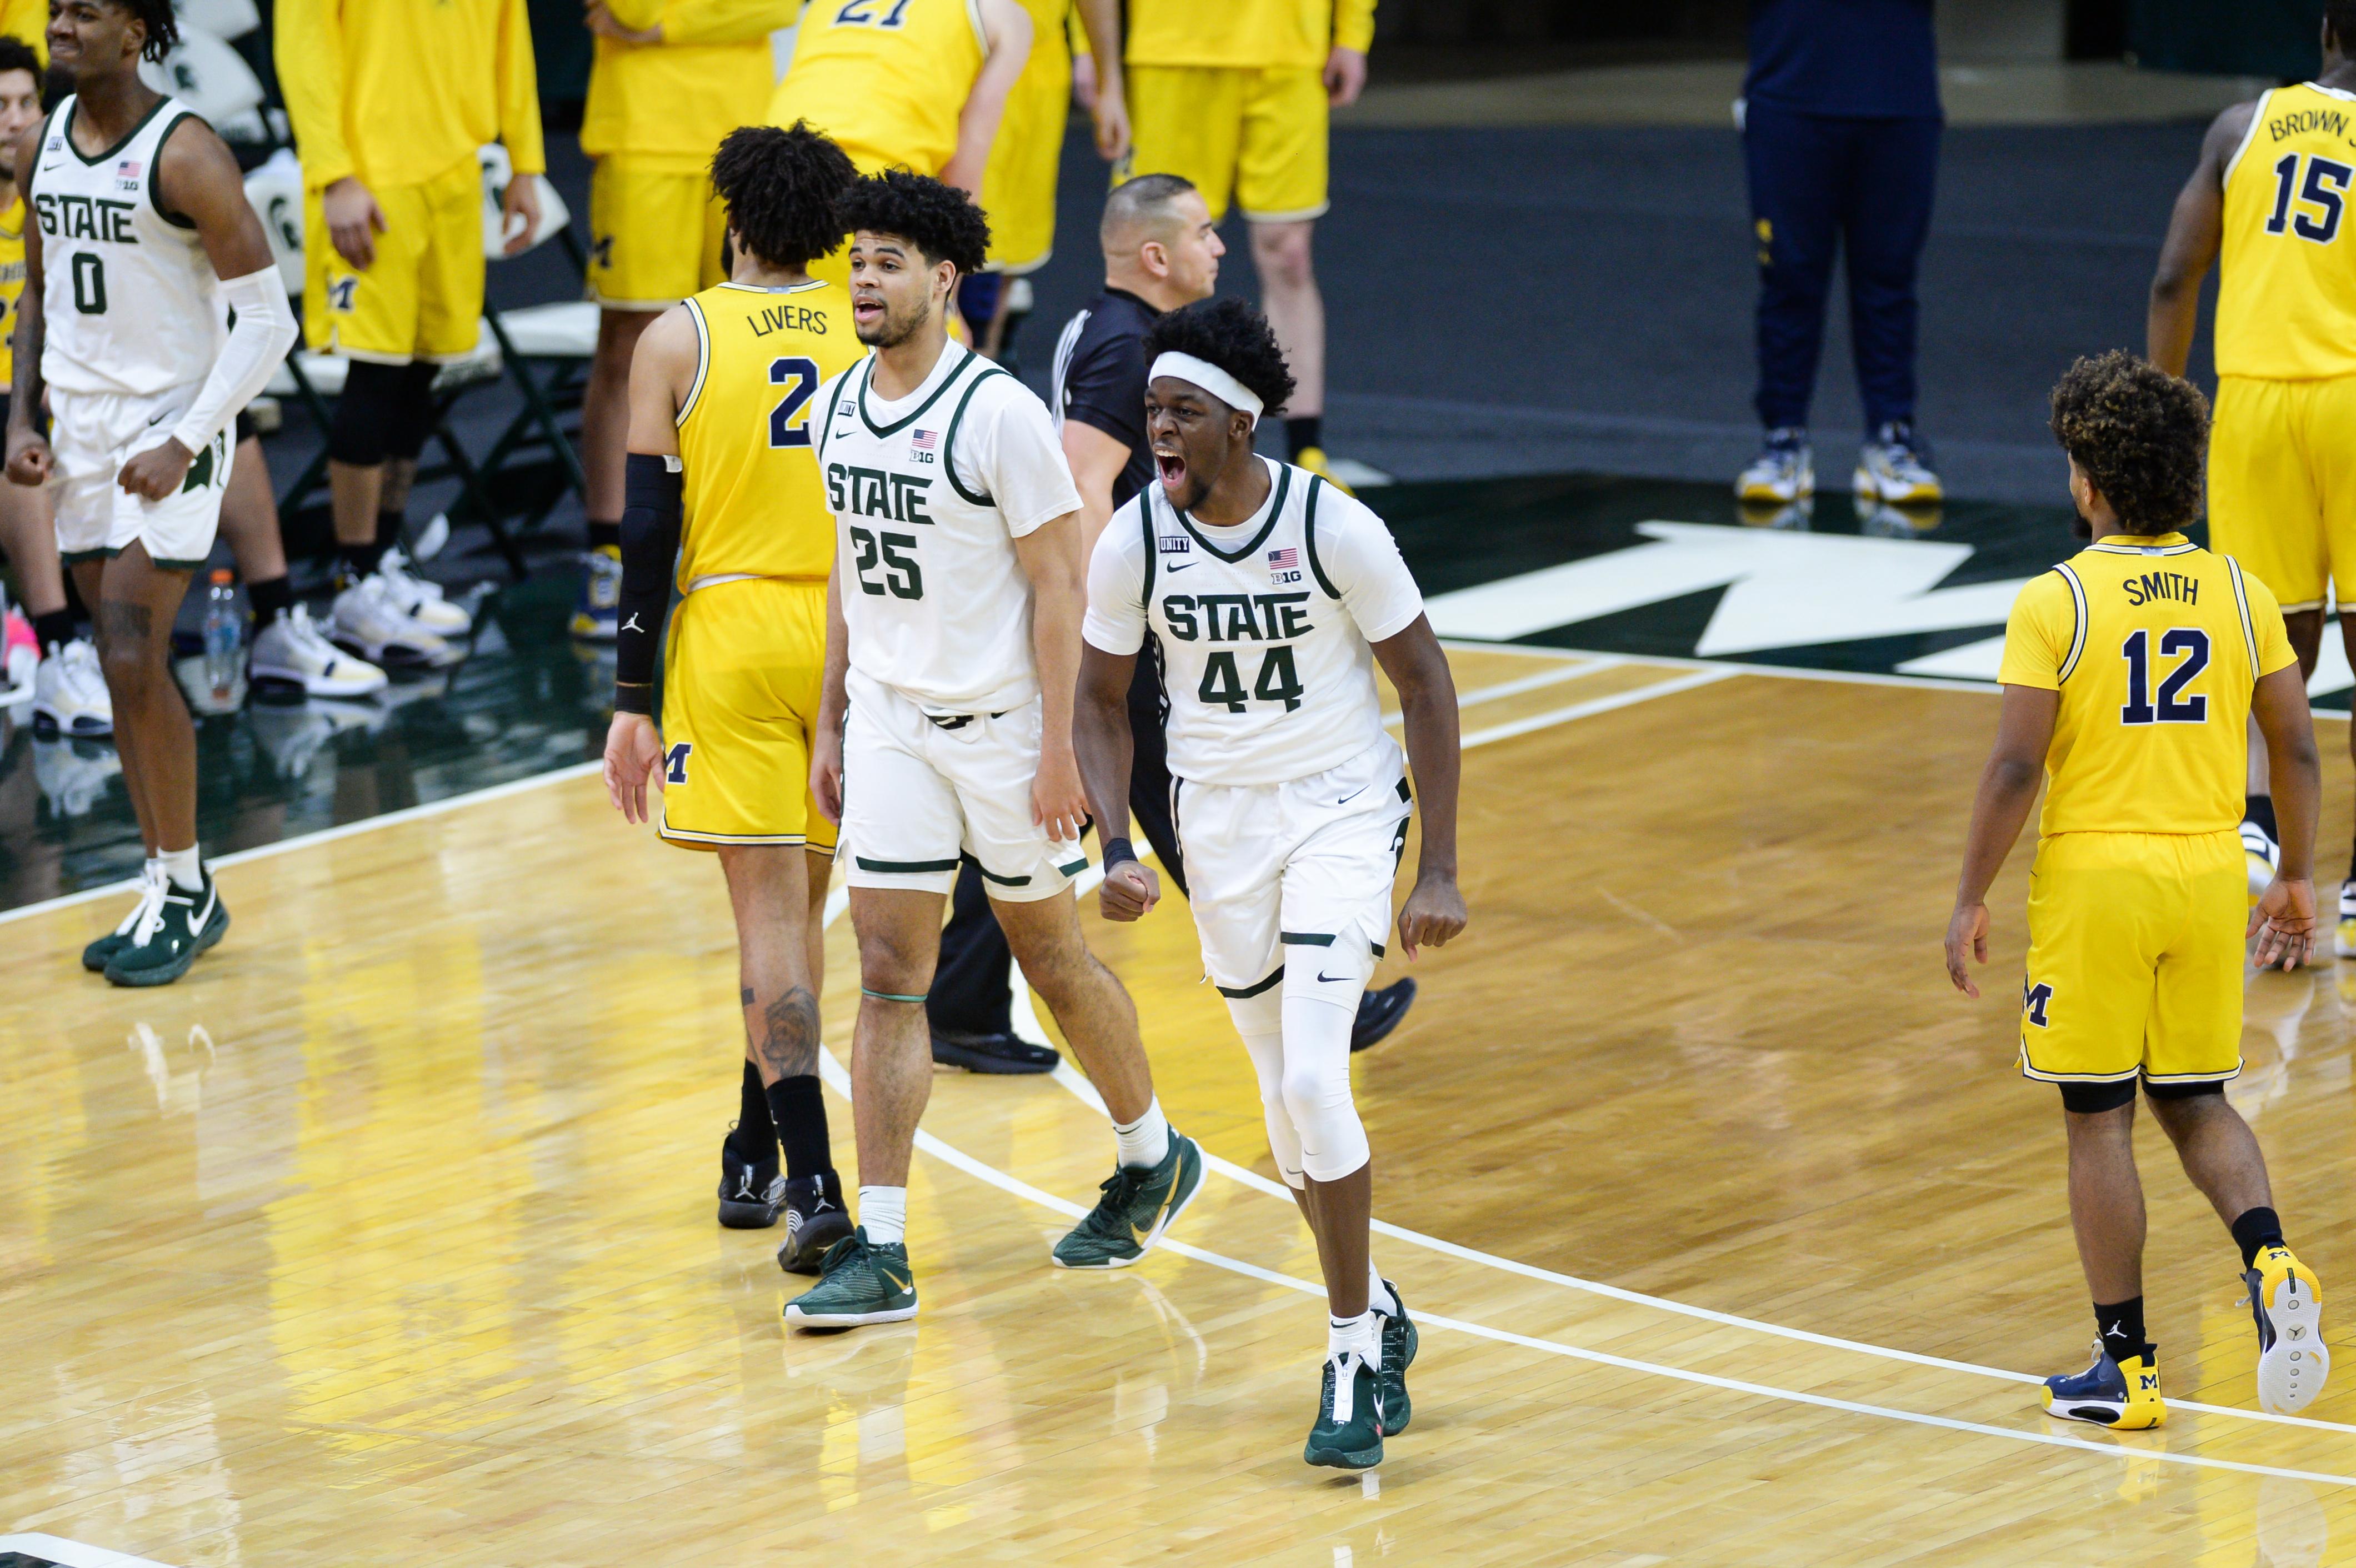 COLLEGE BASKETBALL: MAR 07 Michigan at Michigan State